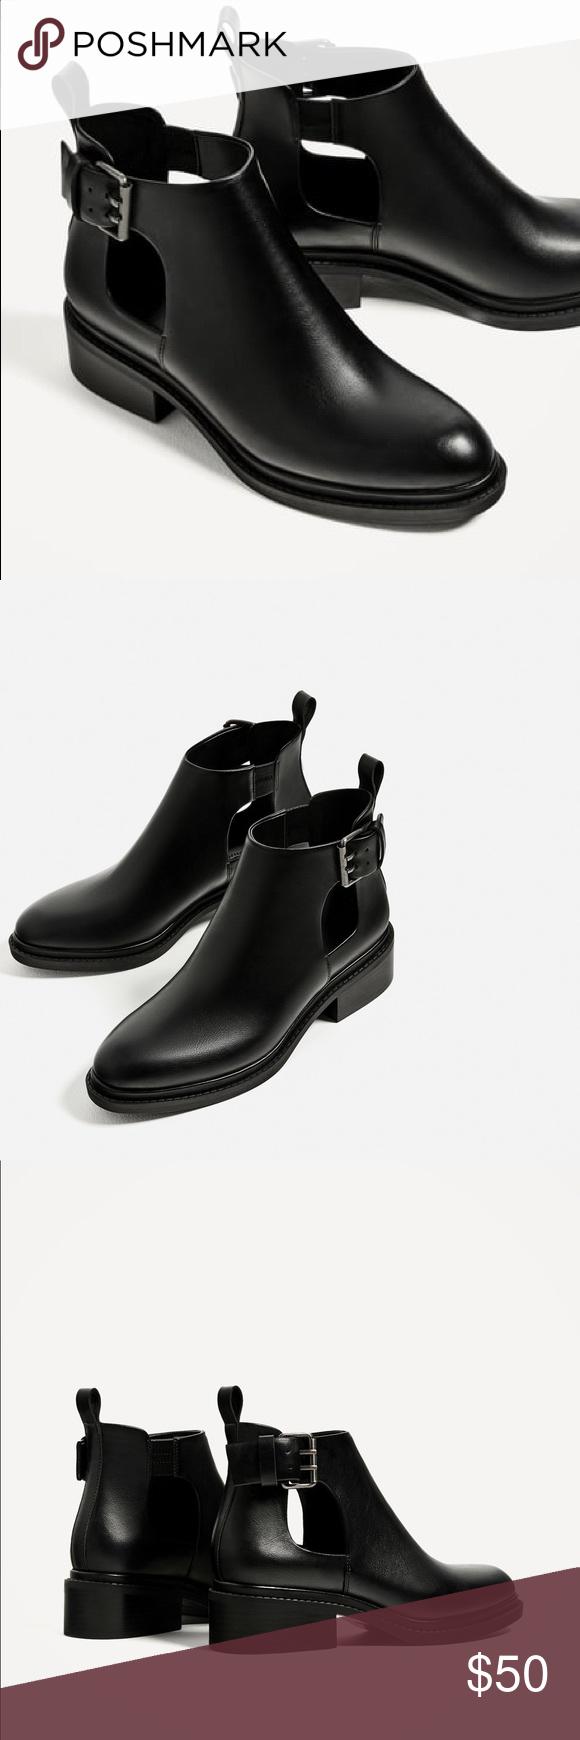 4c65d9dd799 Badass!😍 ZARA Flat Open Ankle Boots 10 Perfect condition Black flat ...